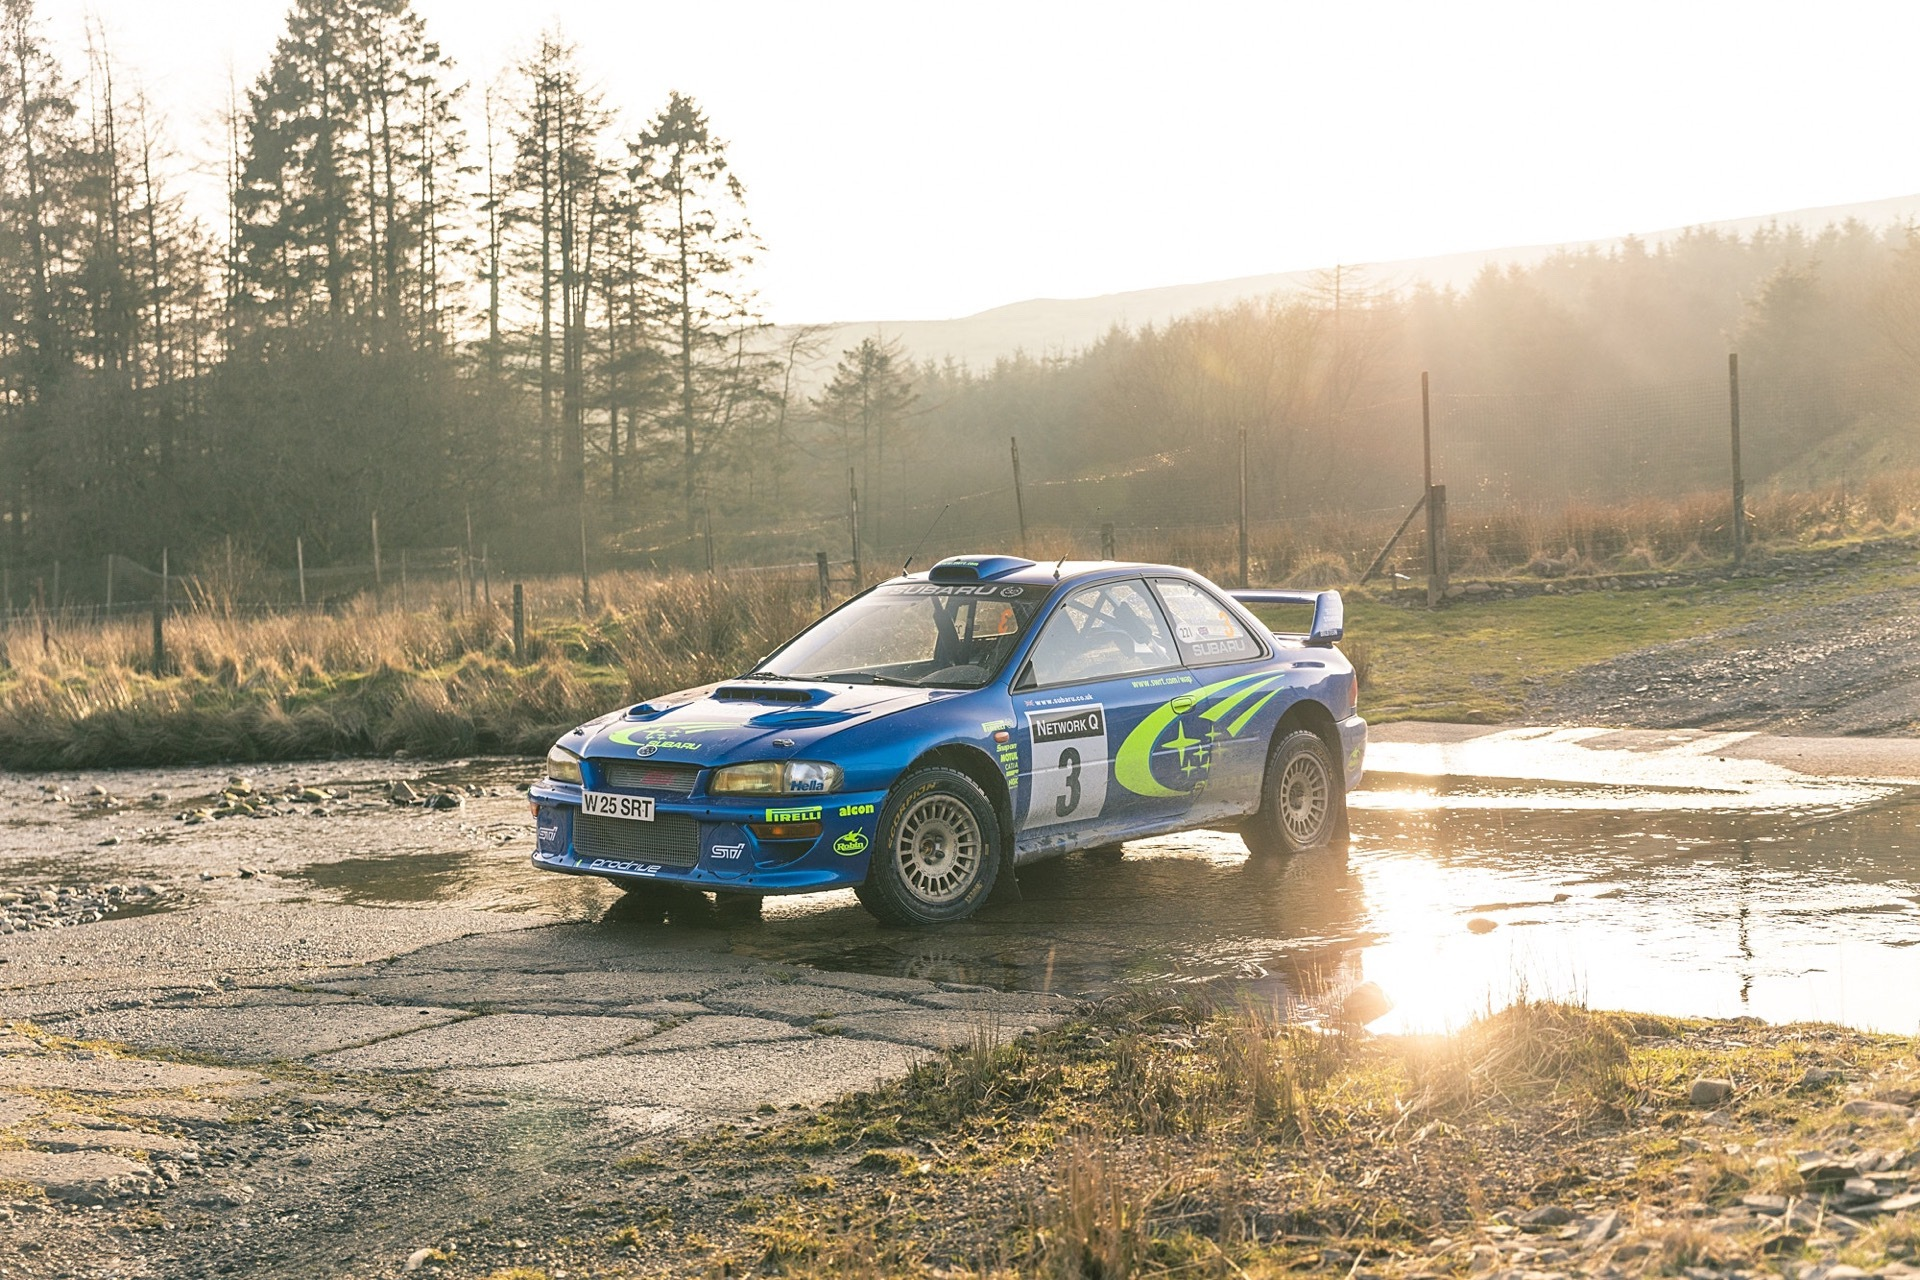 Richard_Burns_Subaru_Impreza_WRC_sale-0015